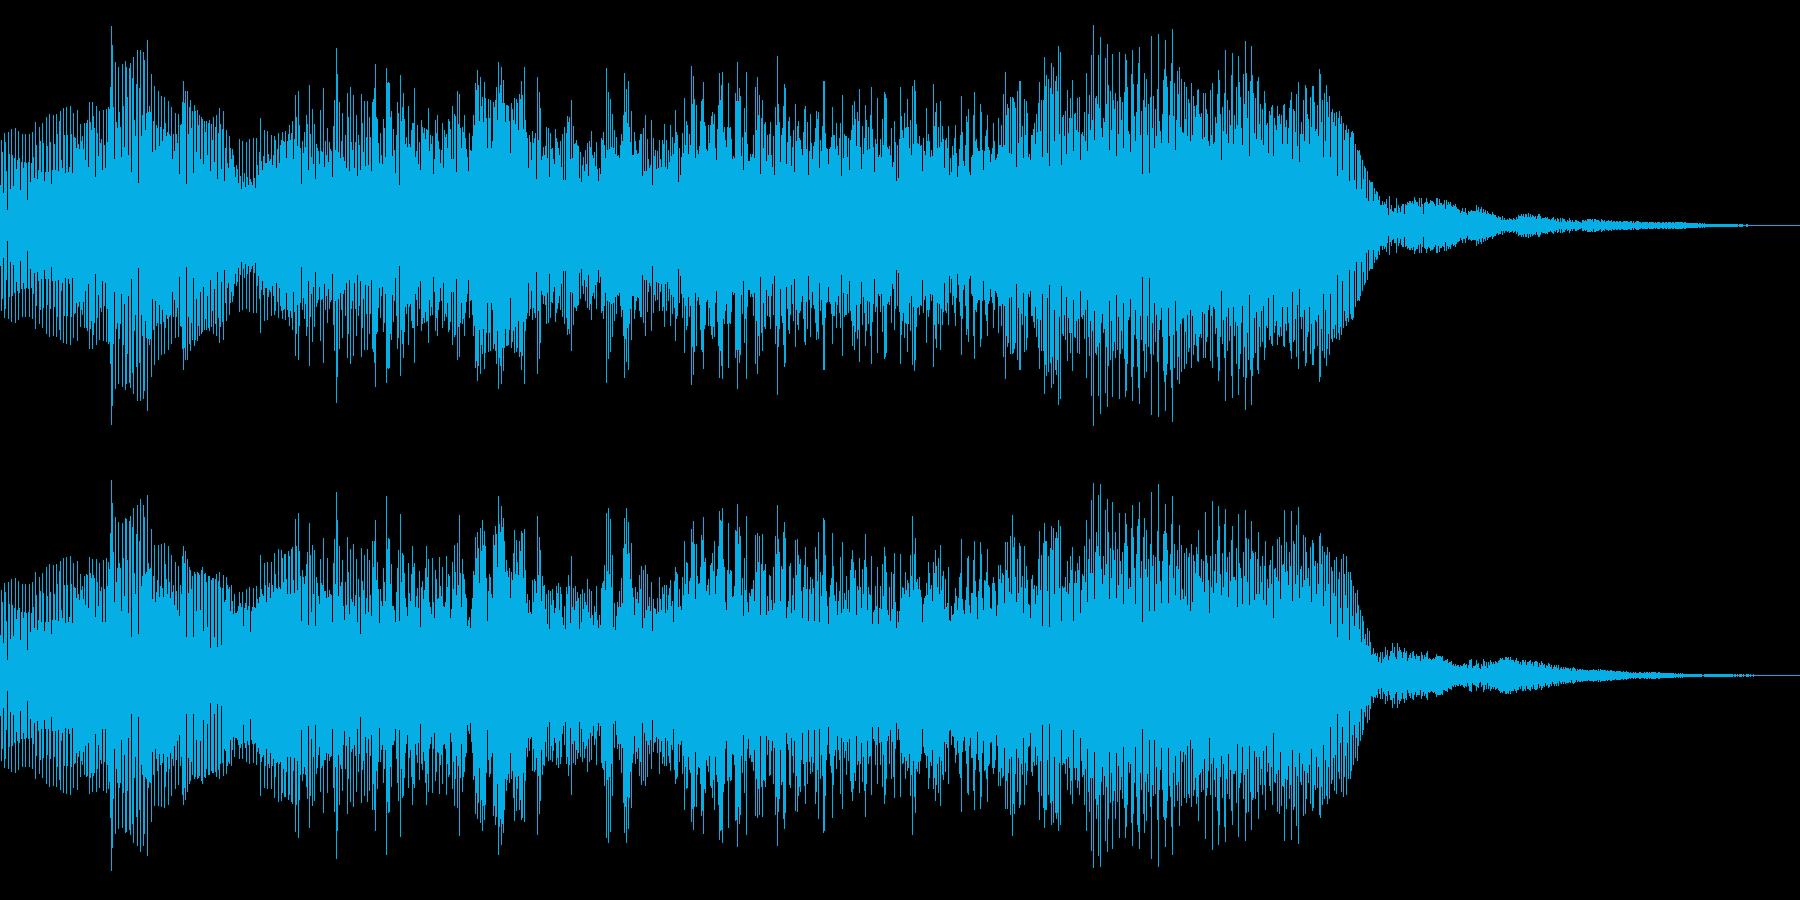 8bit ファミコン風 ゲームクリア の再生済みの波形